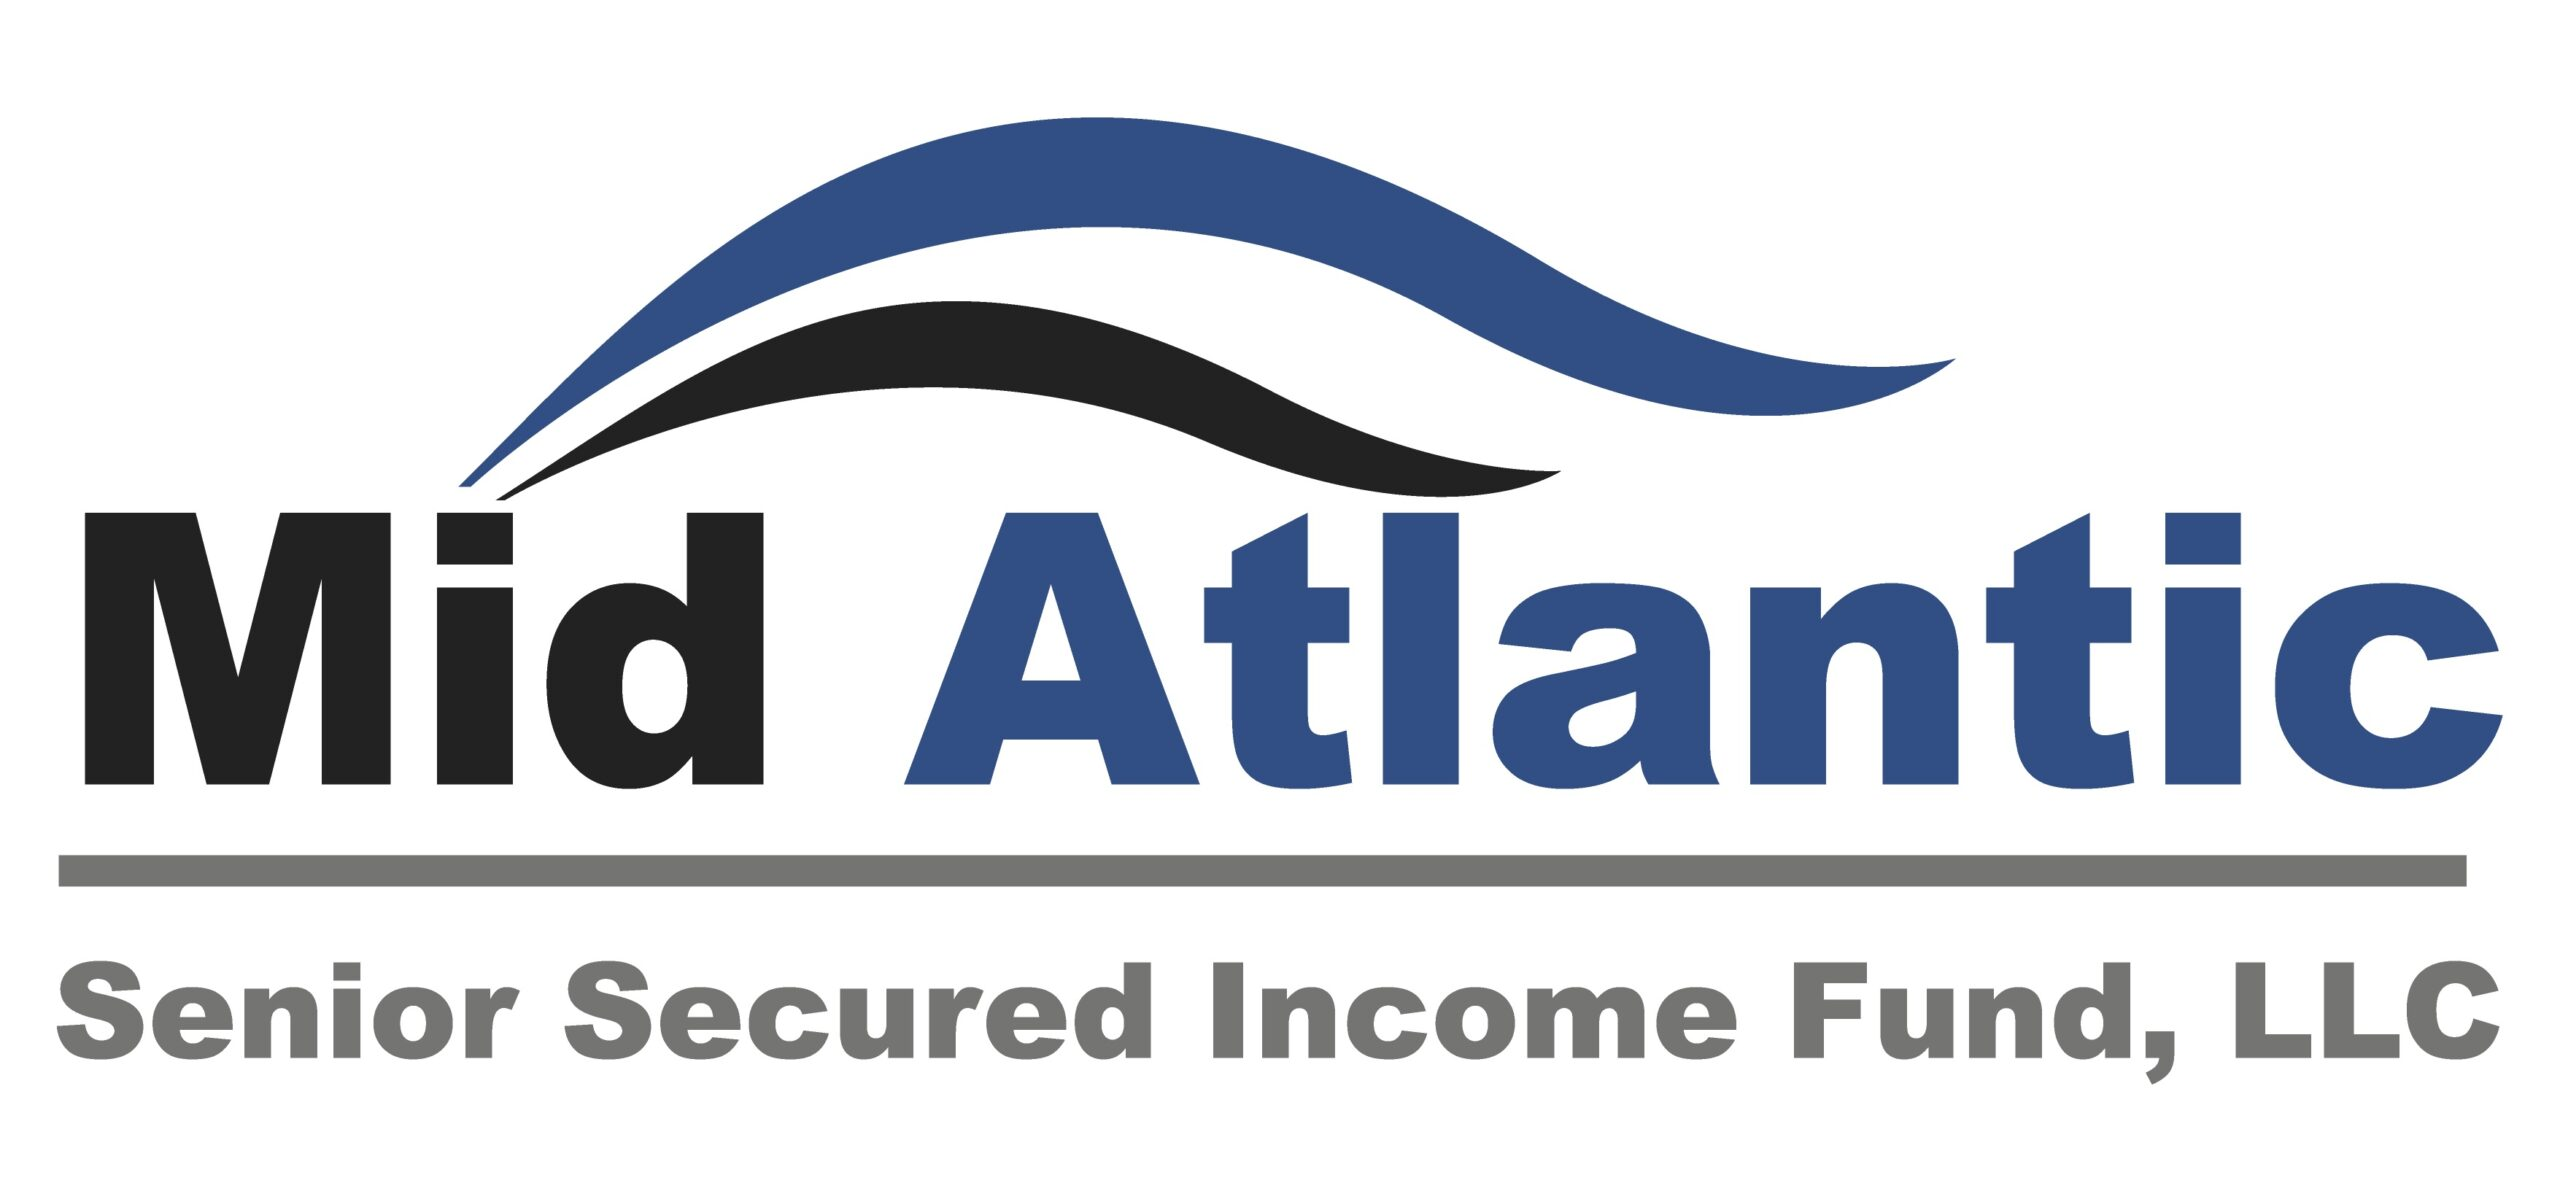 The Mid Atlantic Fund